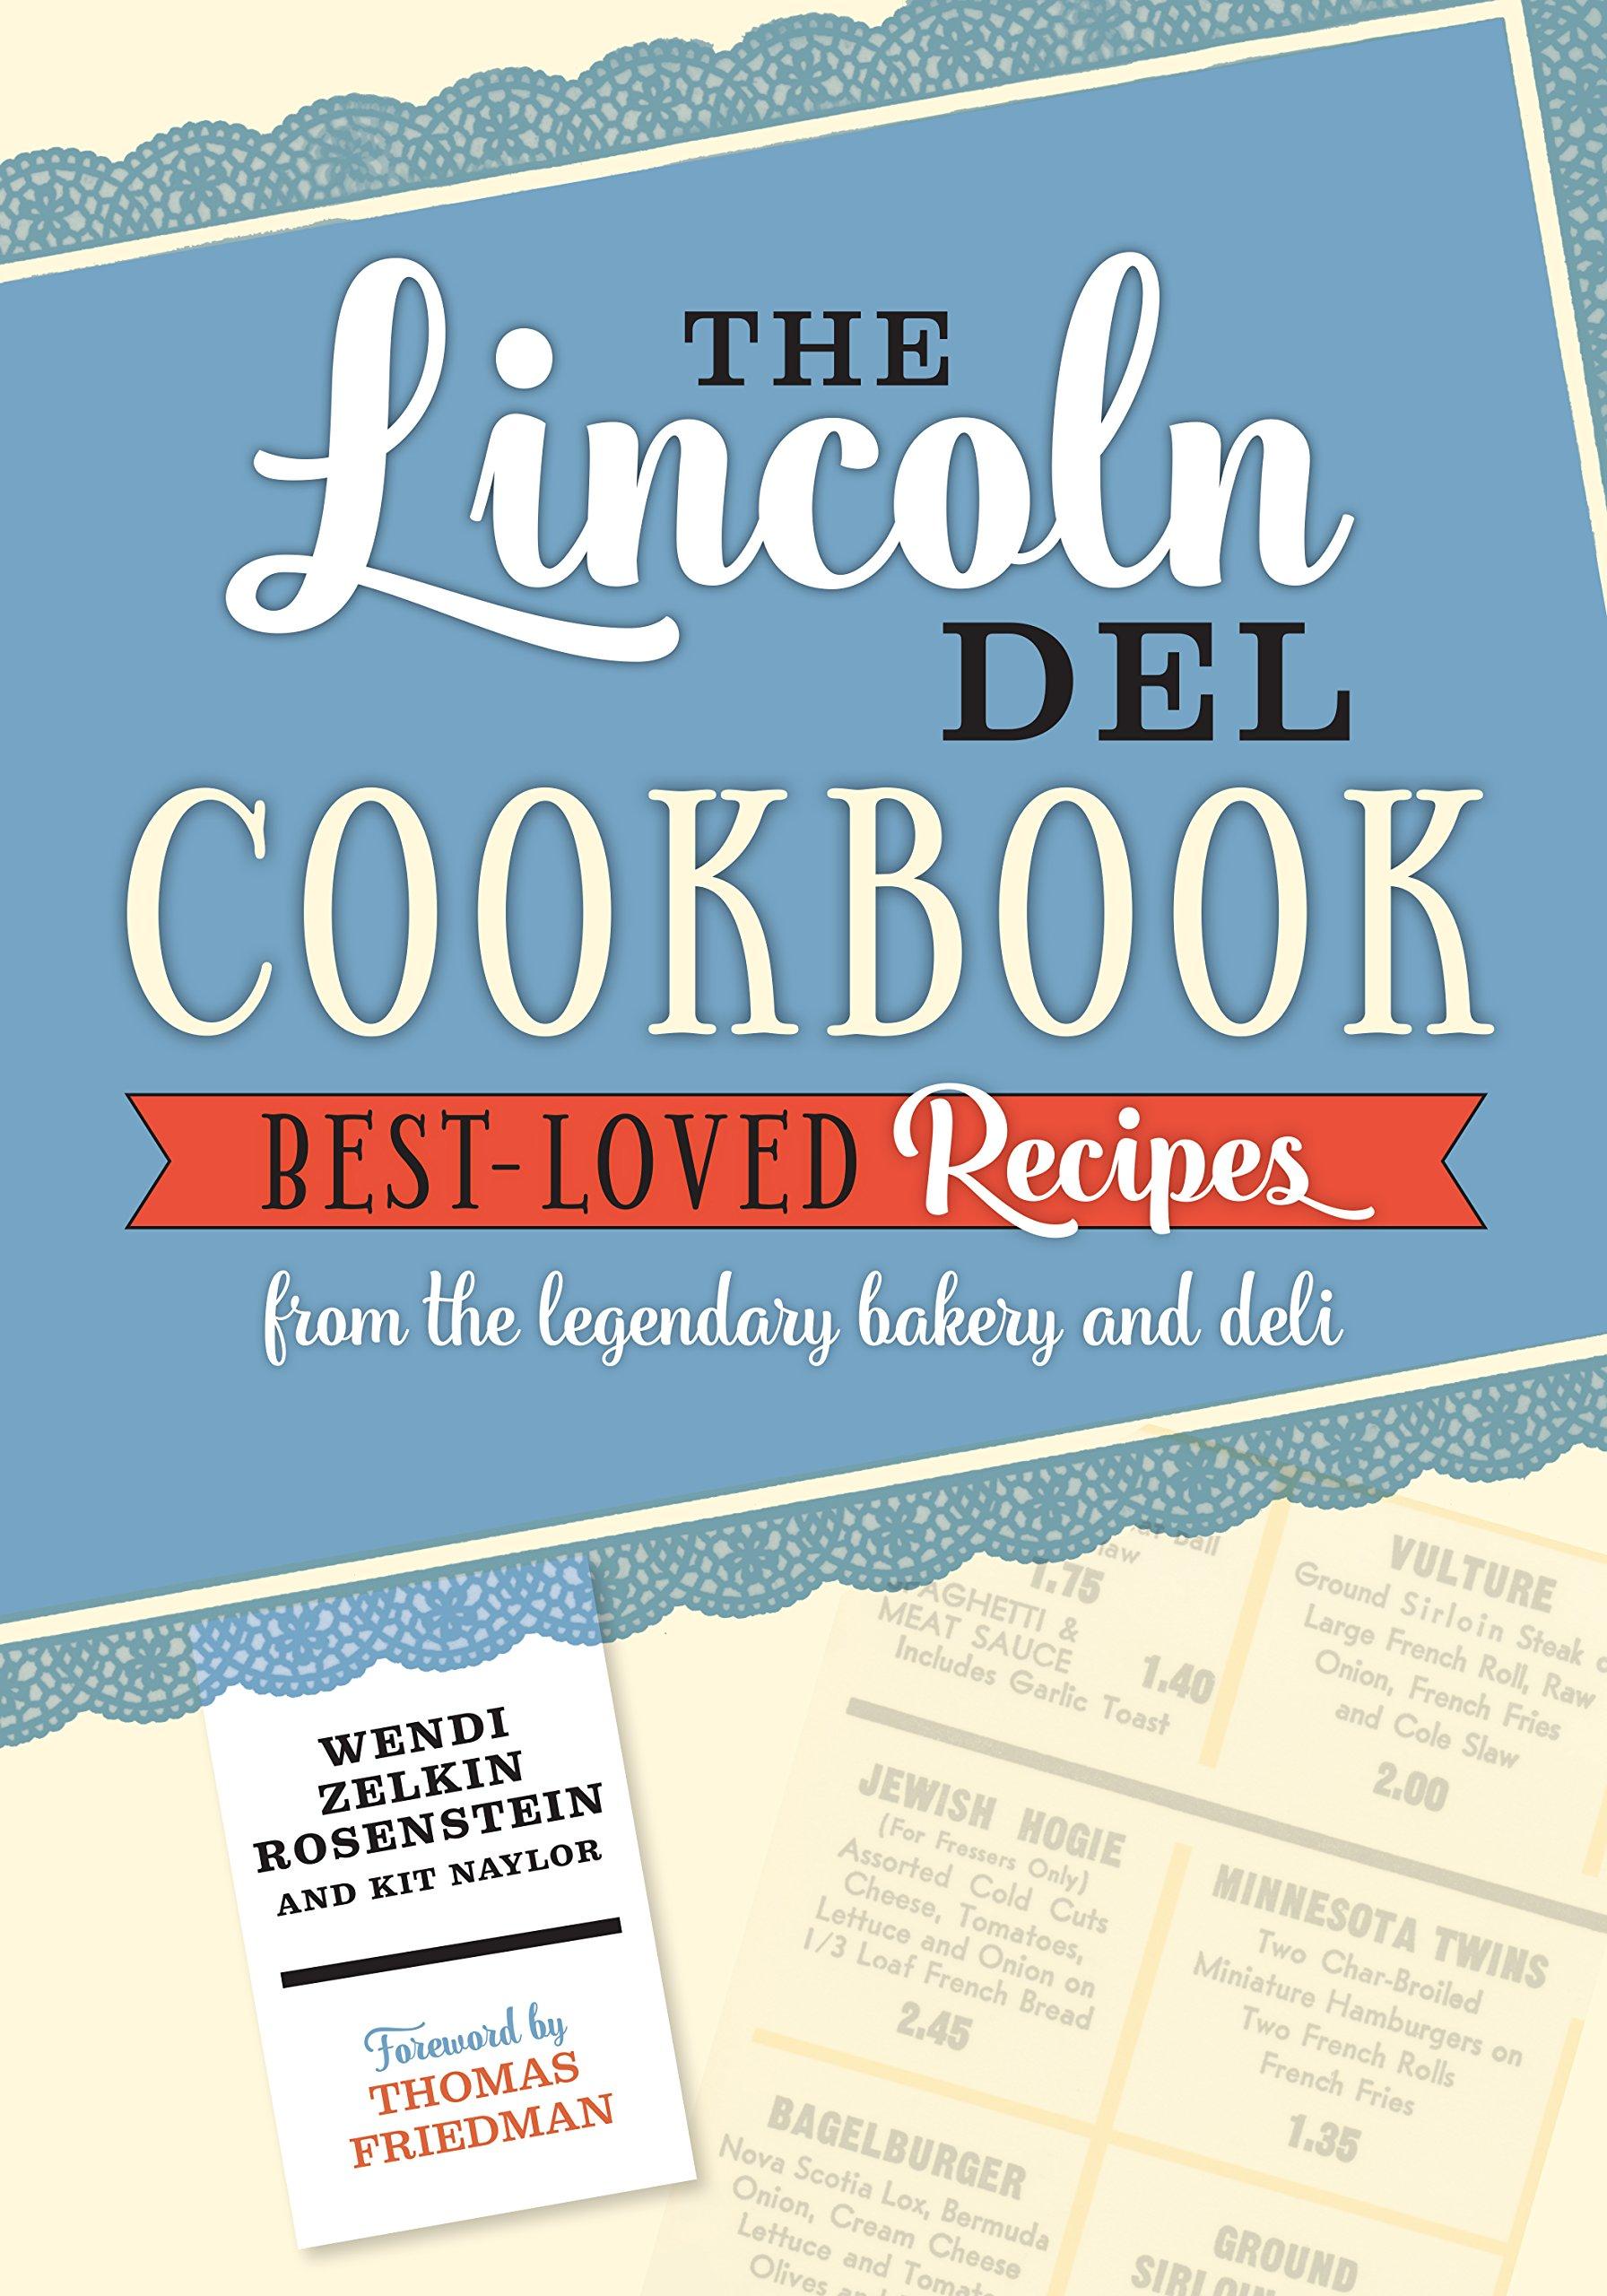 The Lincoln Del Cookbook: Wendi Zelkin Rosenstein, Kit Naylor ...